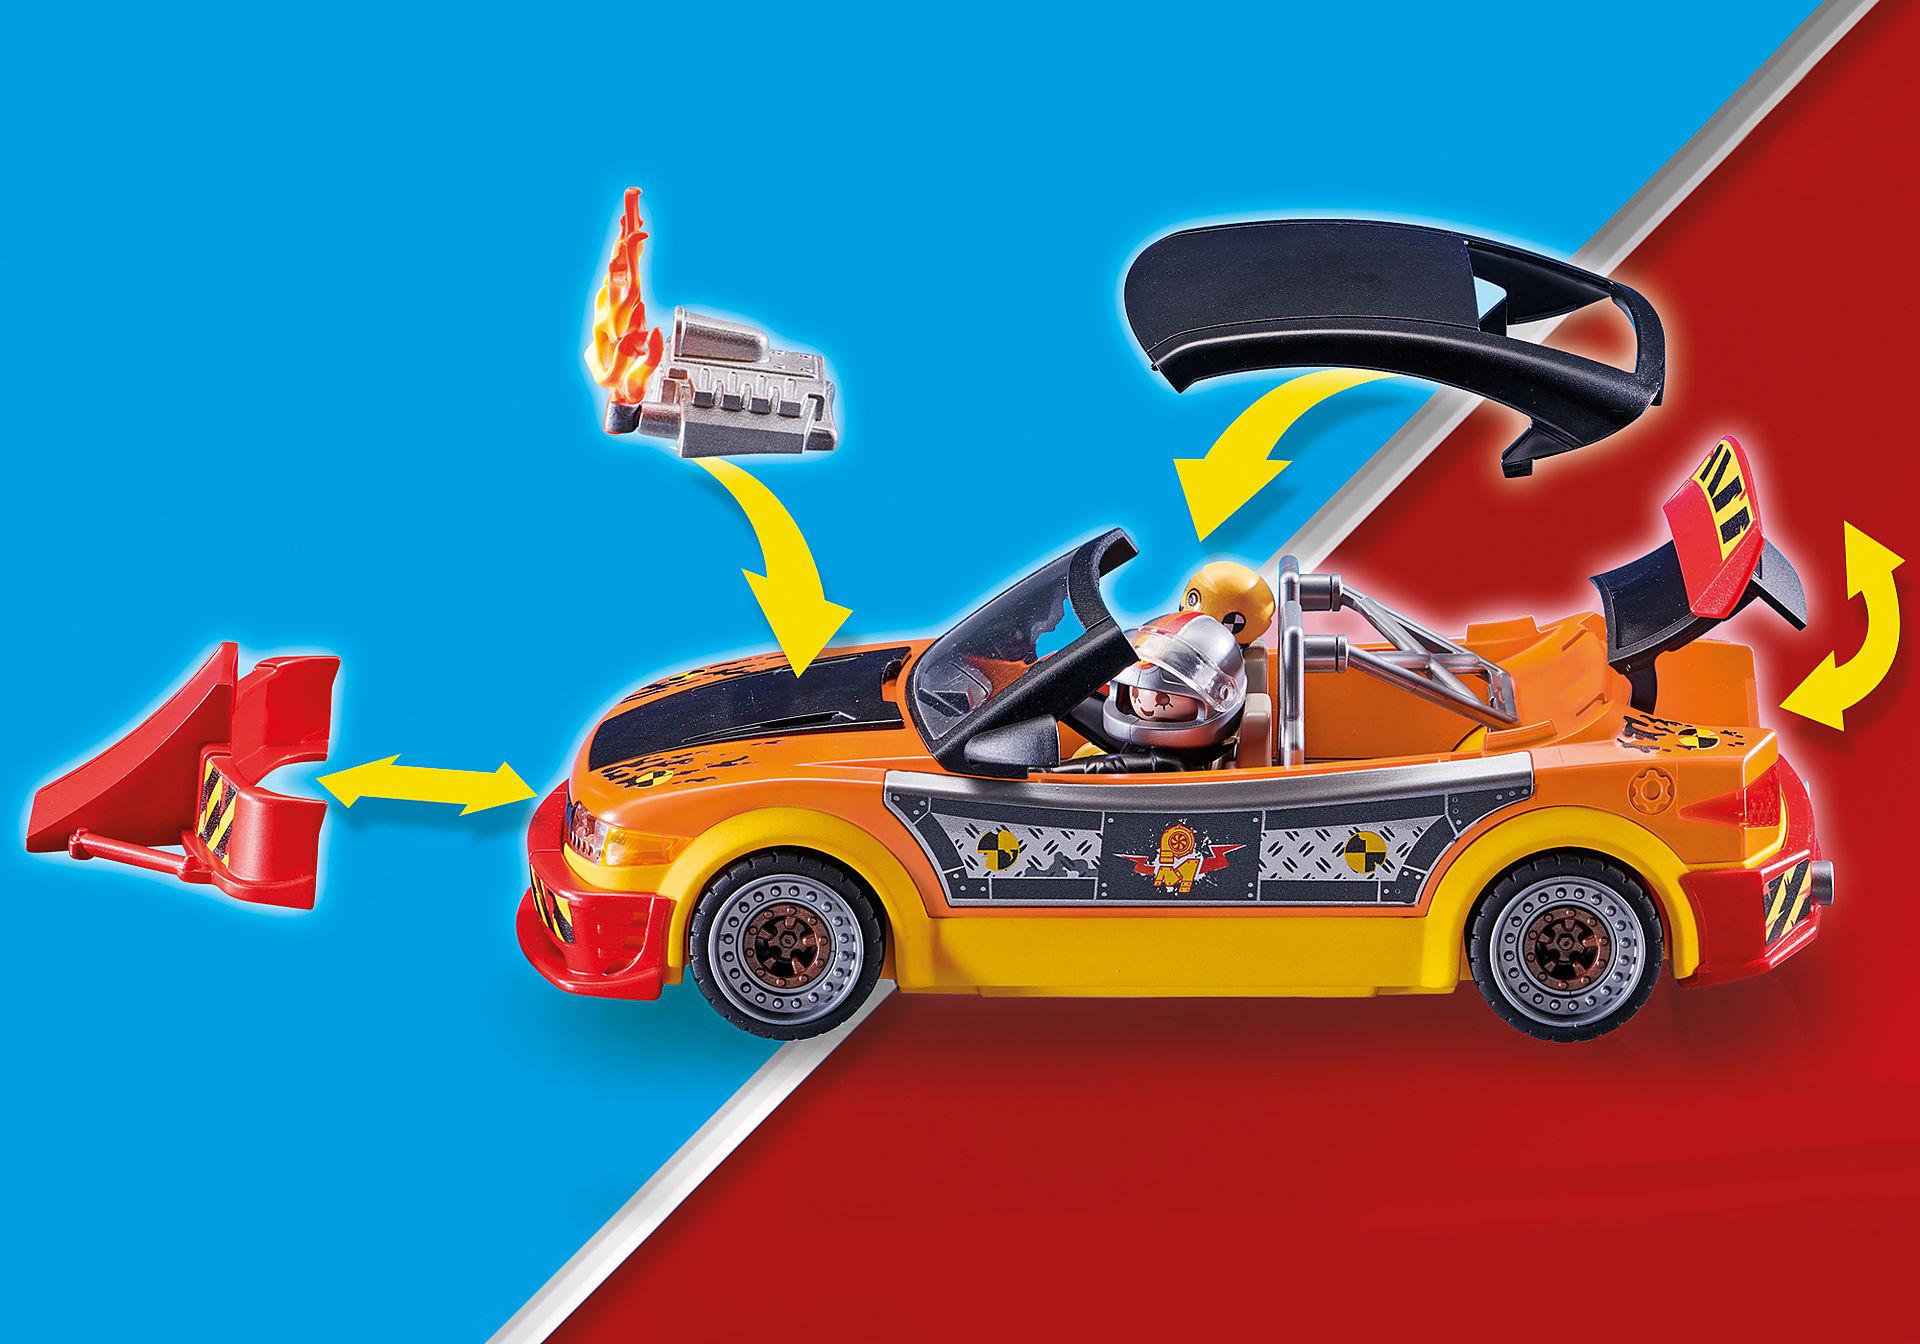 70551 Stunt Show Crash Car zoom image6